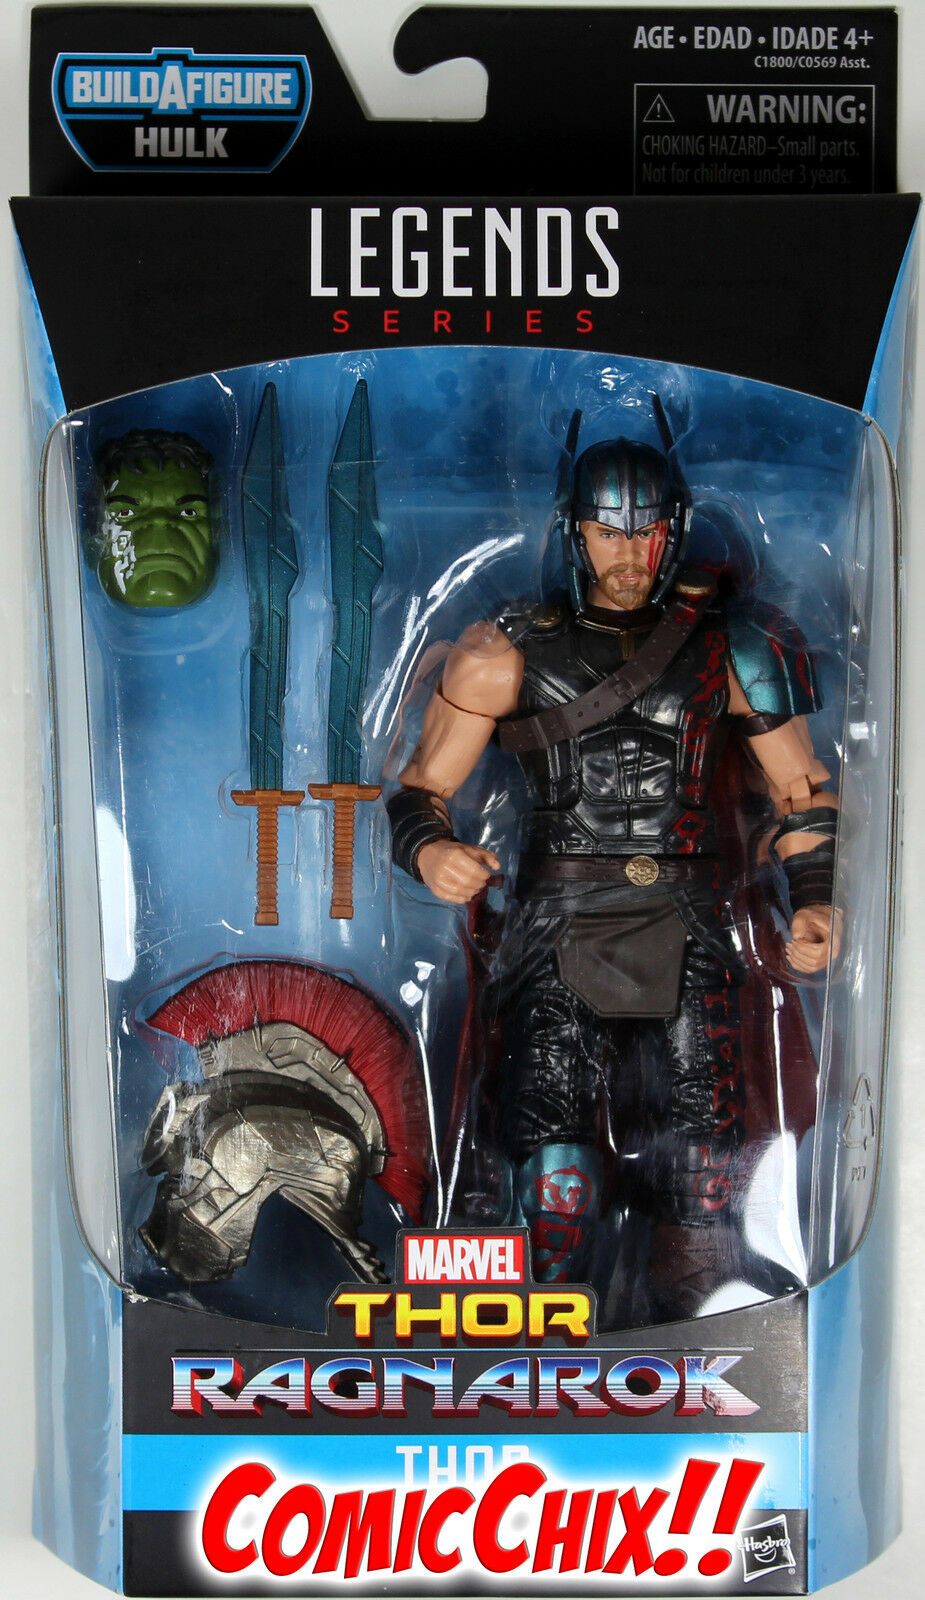 Marvel Legends Thor Figura De Acción (película)  Thor  Ragnarok  Hulk Serie Baf